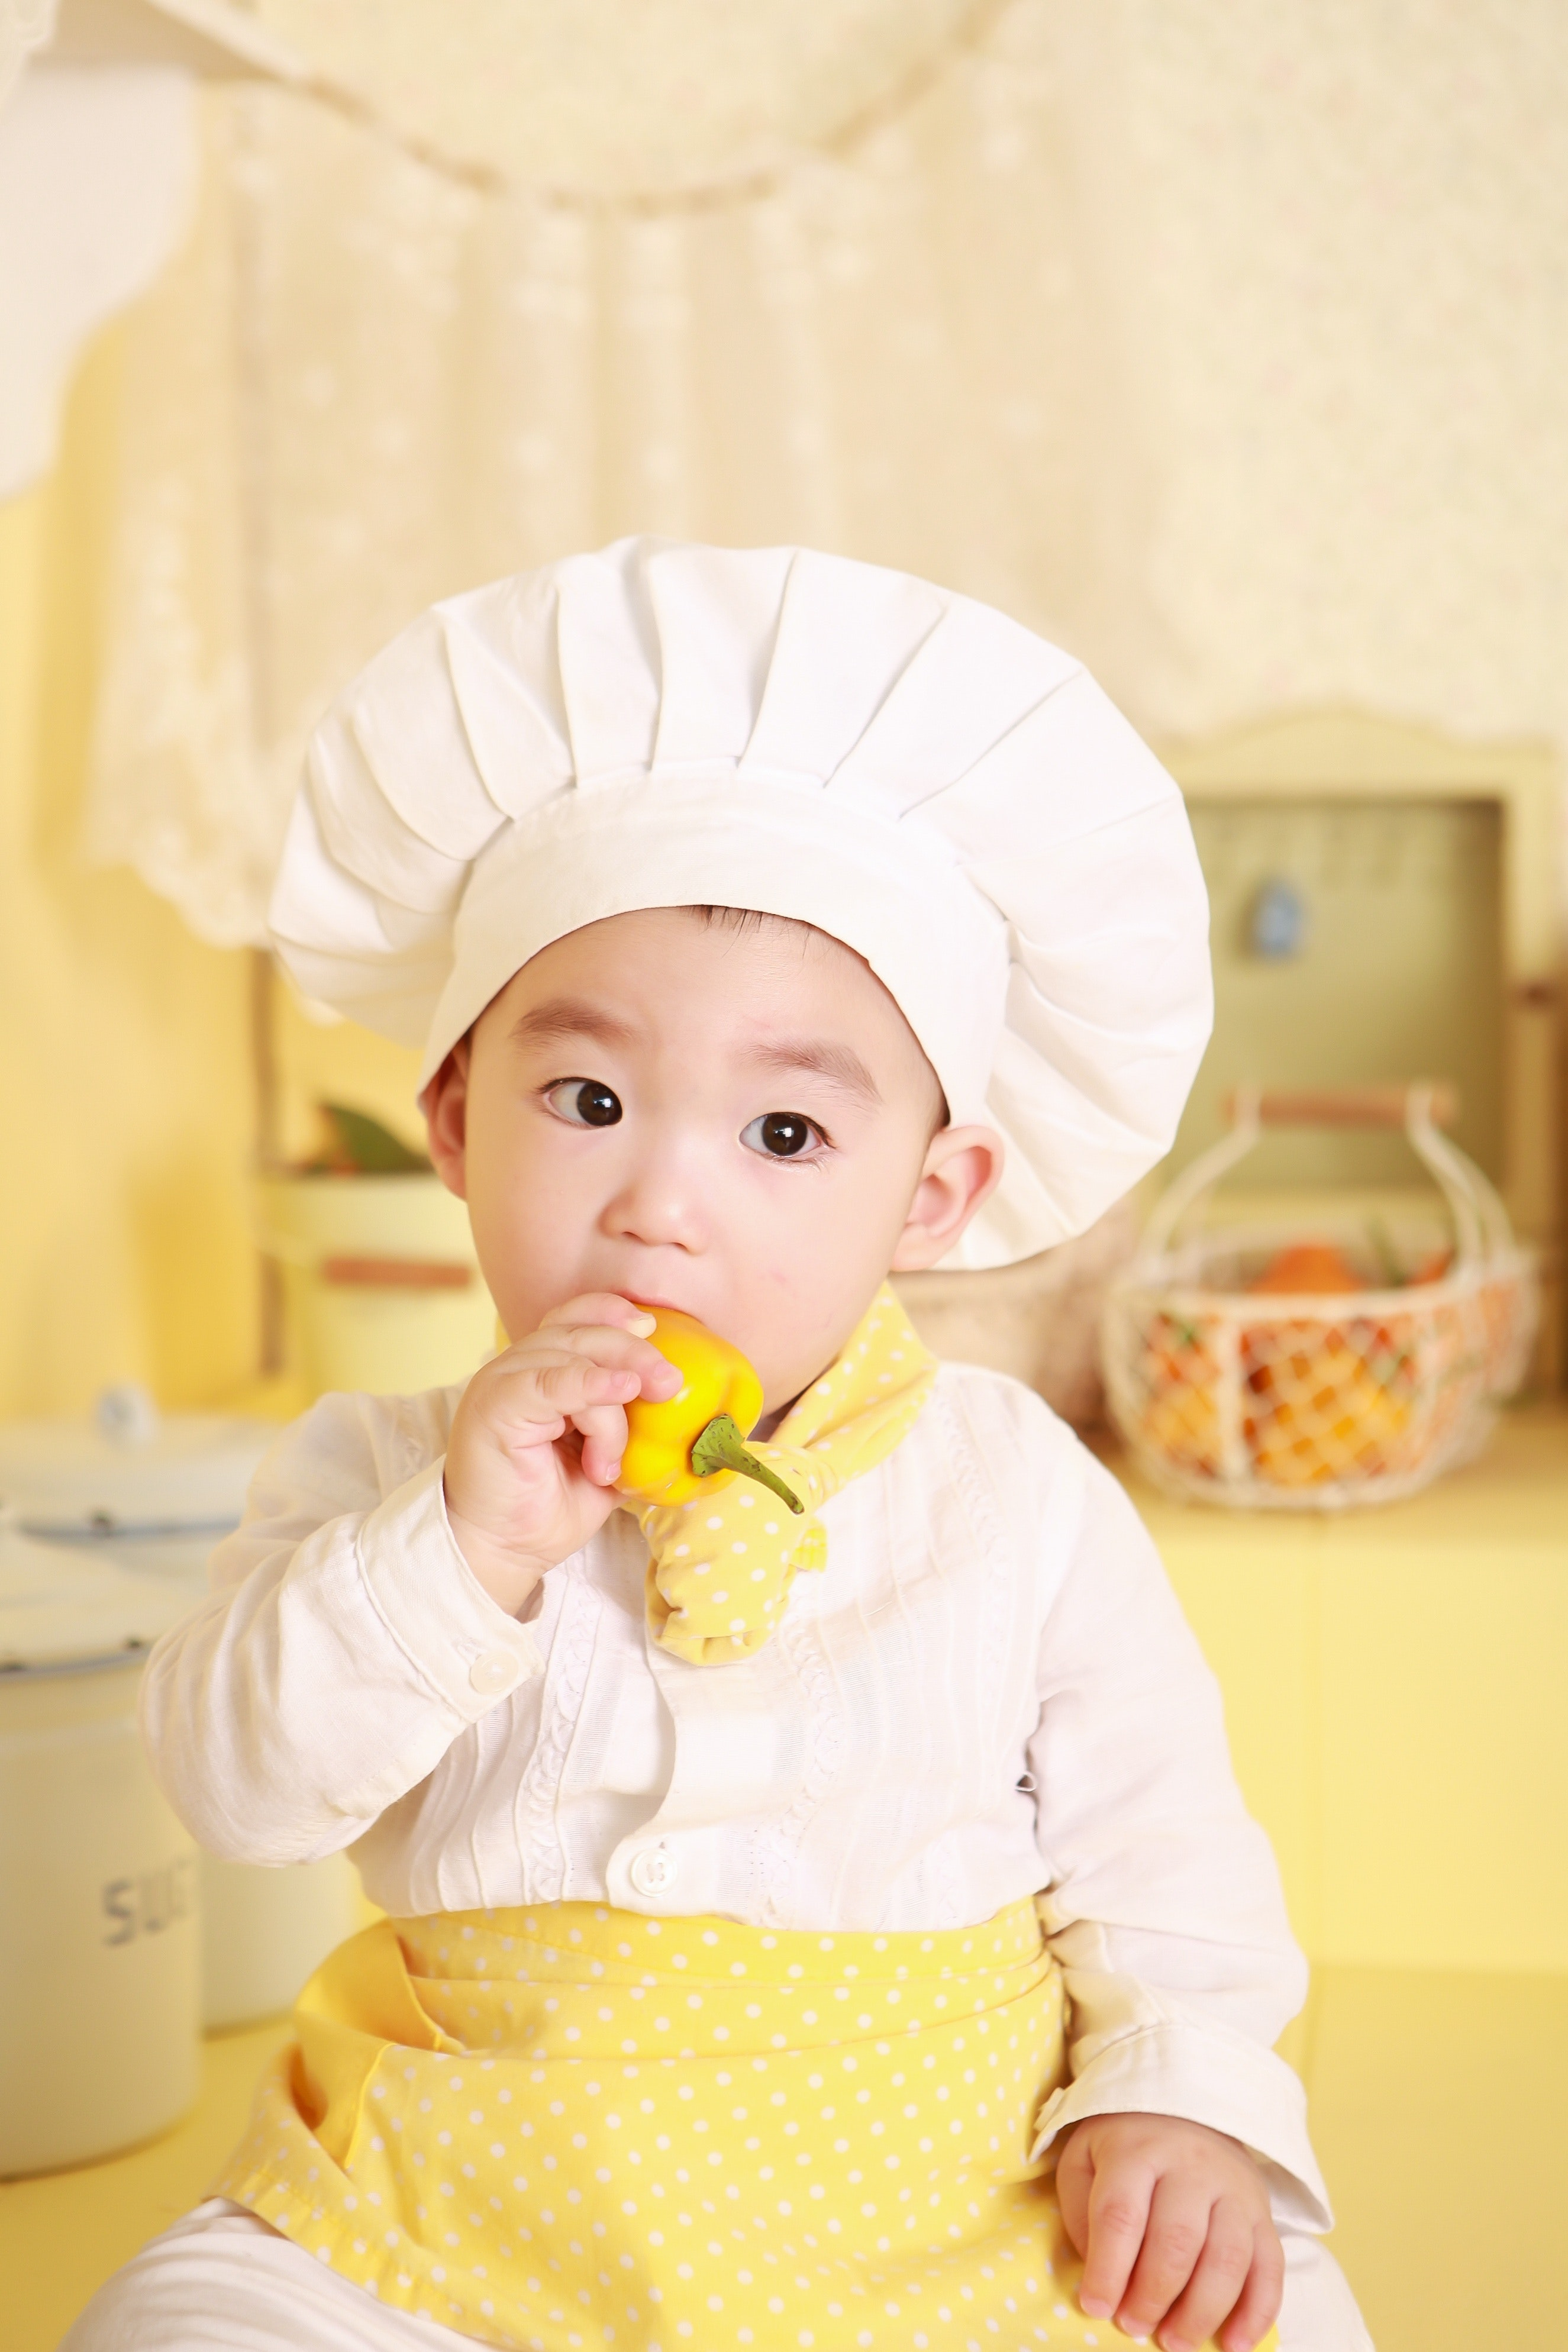 baby madlavning